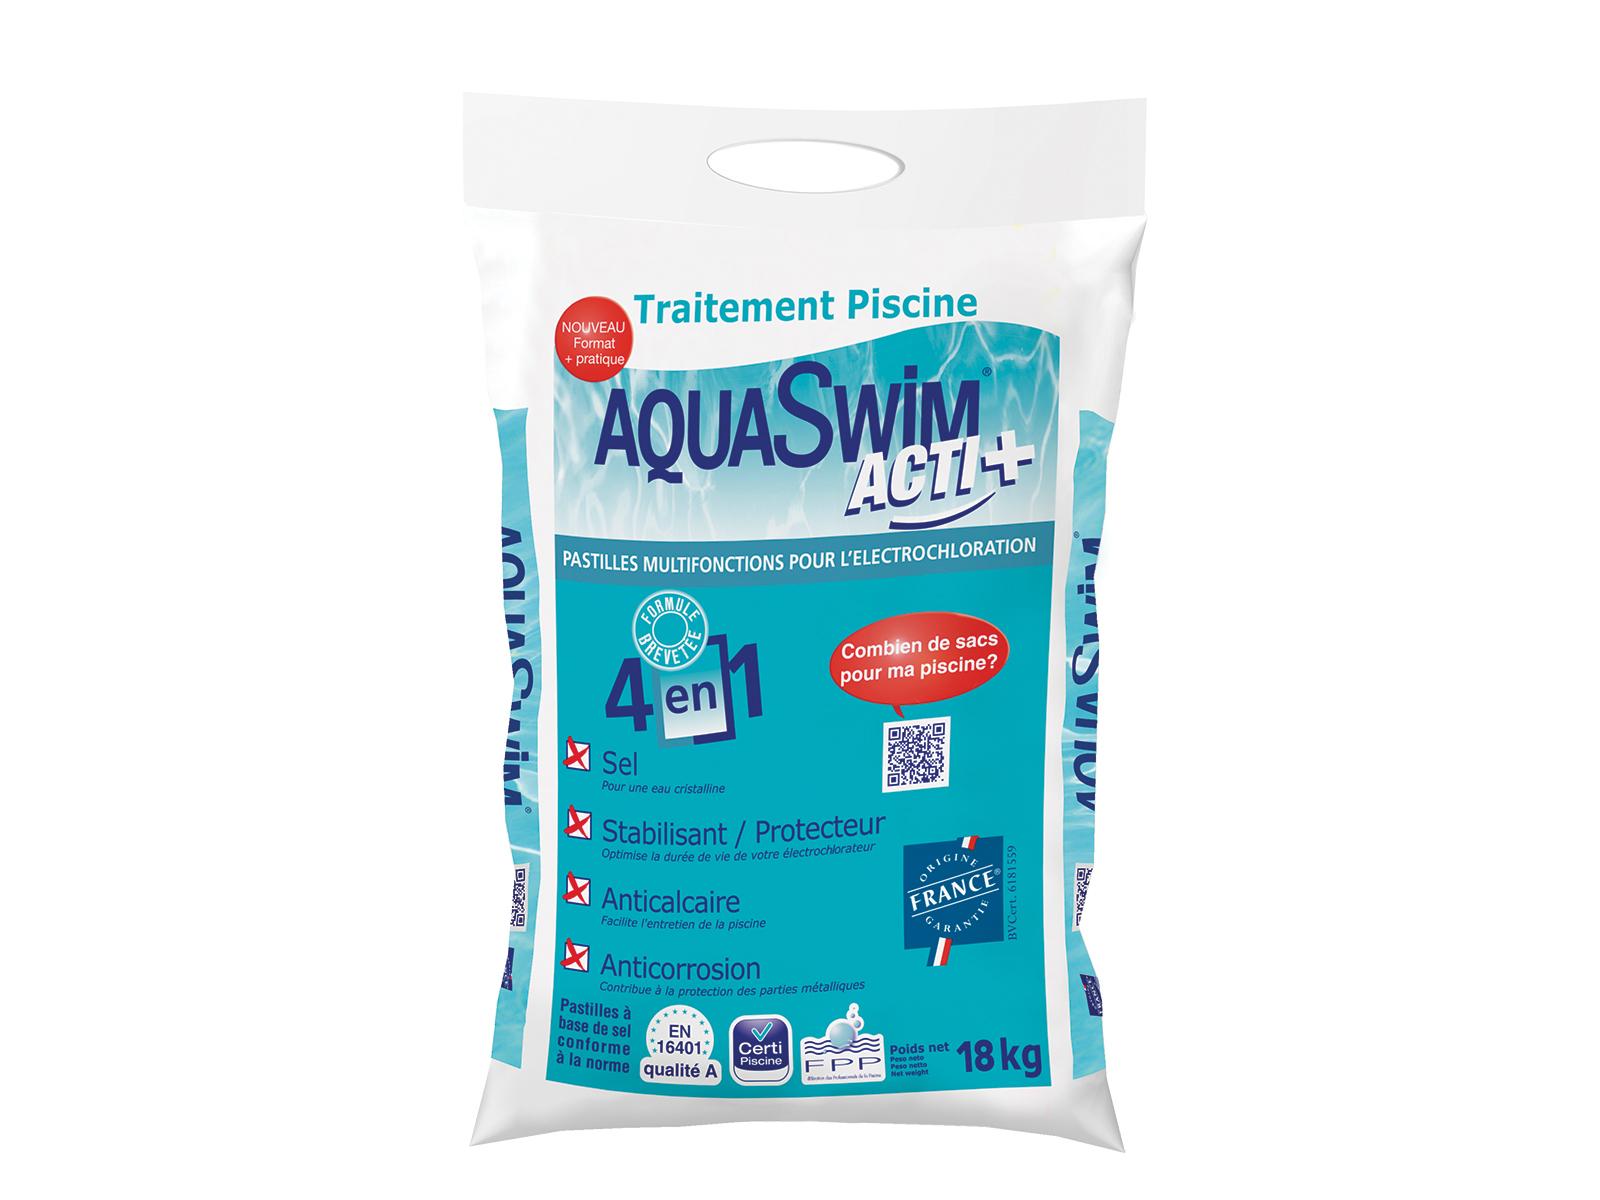 Aquaswim Acti+ Sel Piscine serapportantà Sel De Piscine